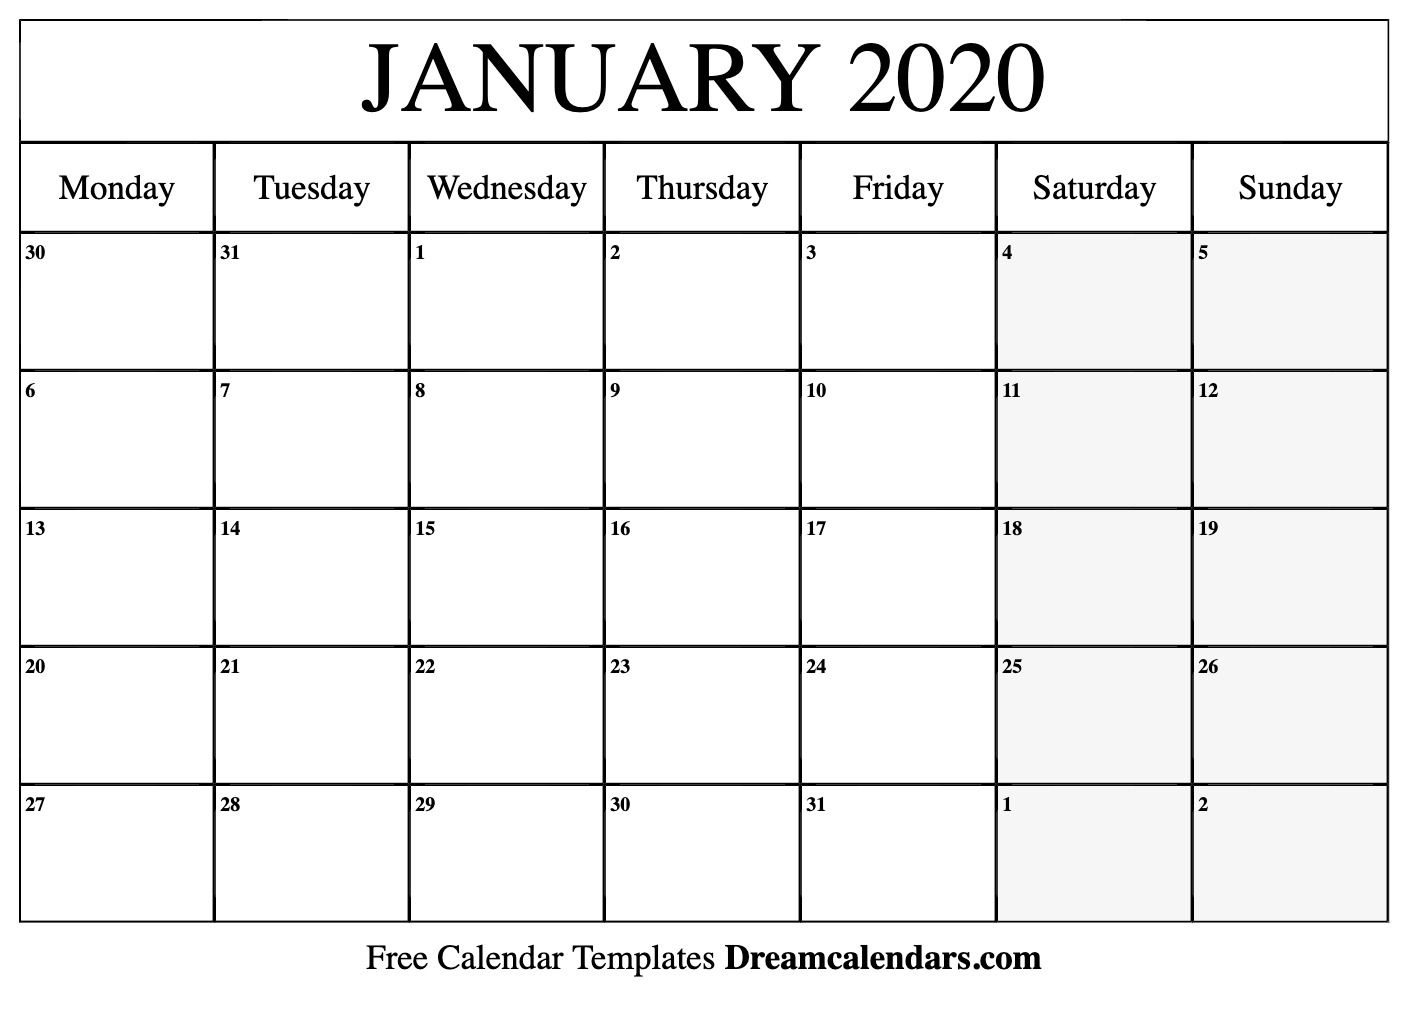 January 2020 Calendar Printable (Monday)   Calendar, Free With Sunrise Sunset Calendar Printable